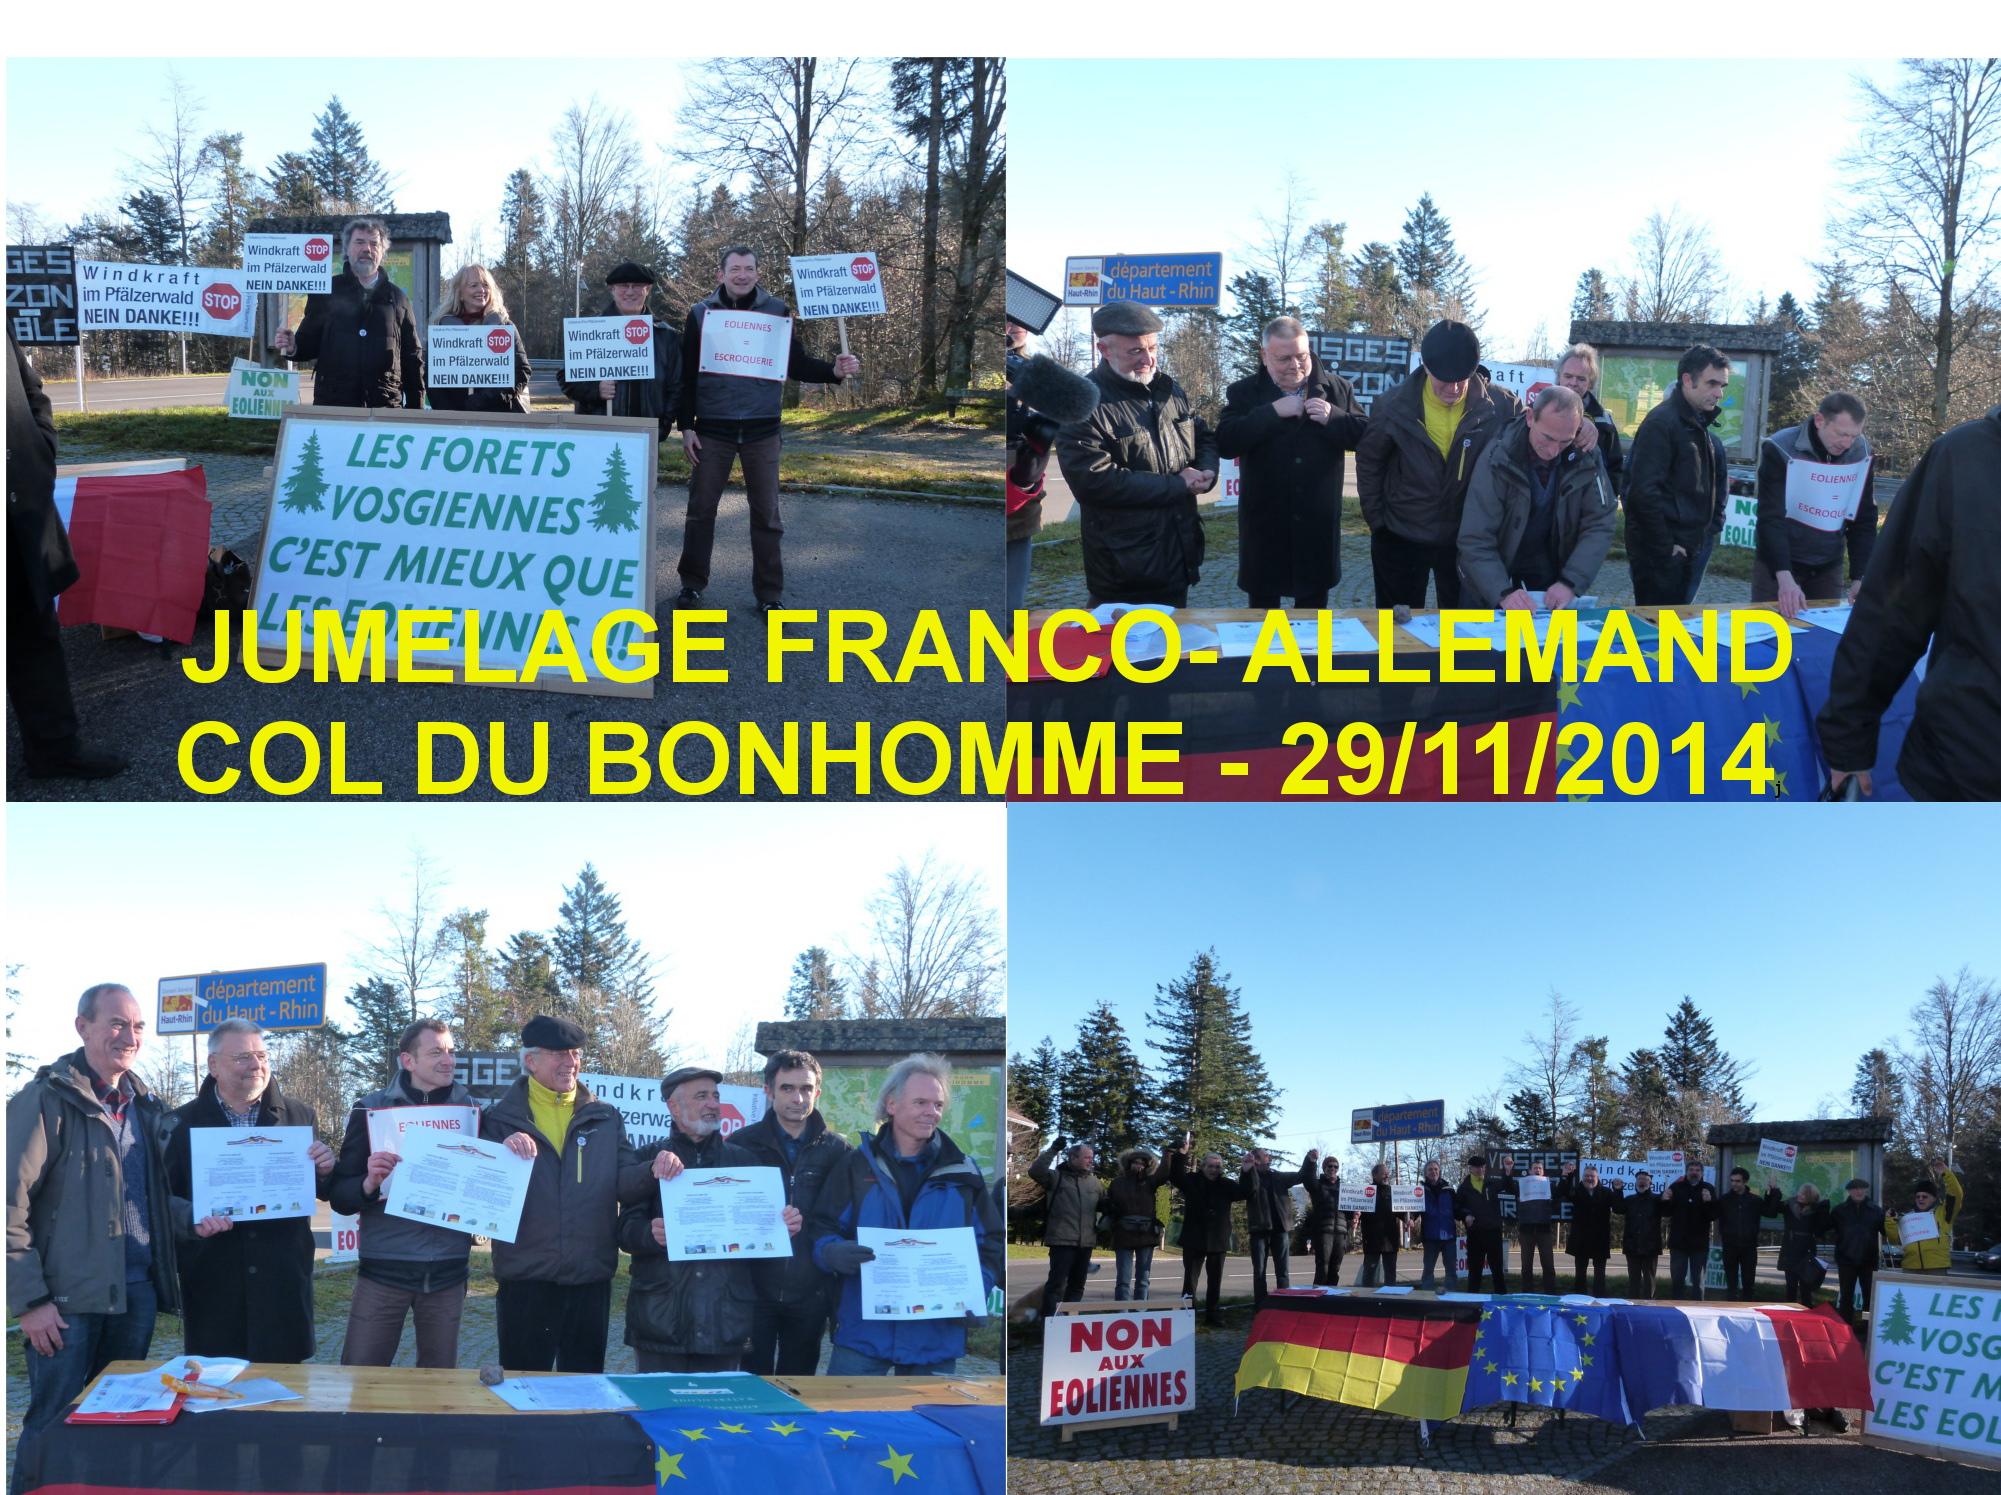 JUMELAGE_FRANCO_ALLEMAND_COL du Bonhomme_29-11-2014